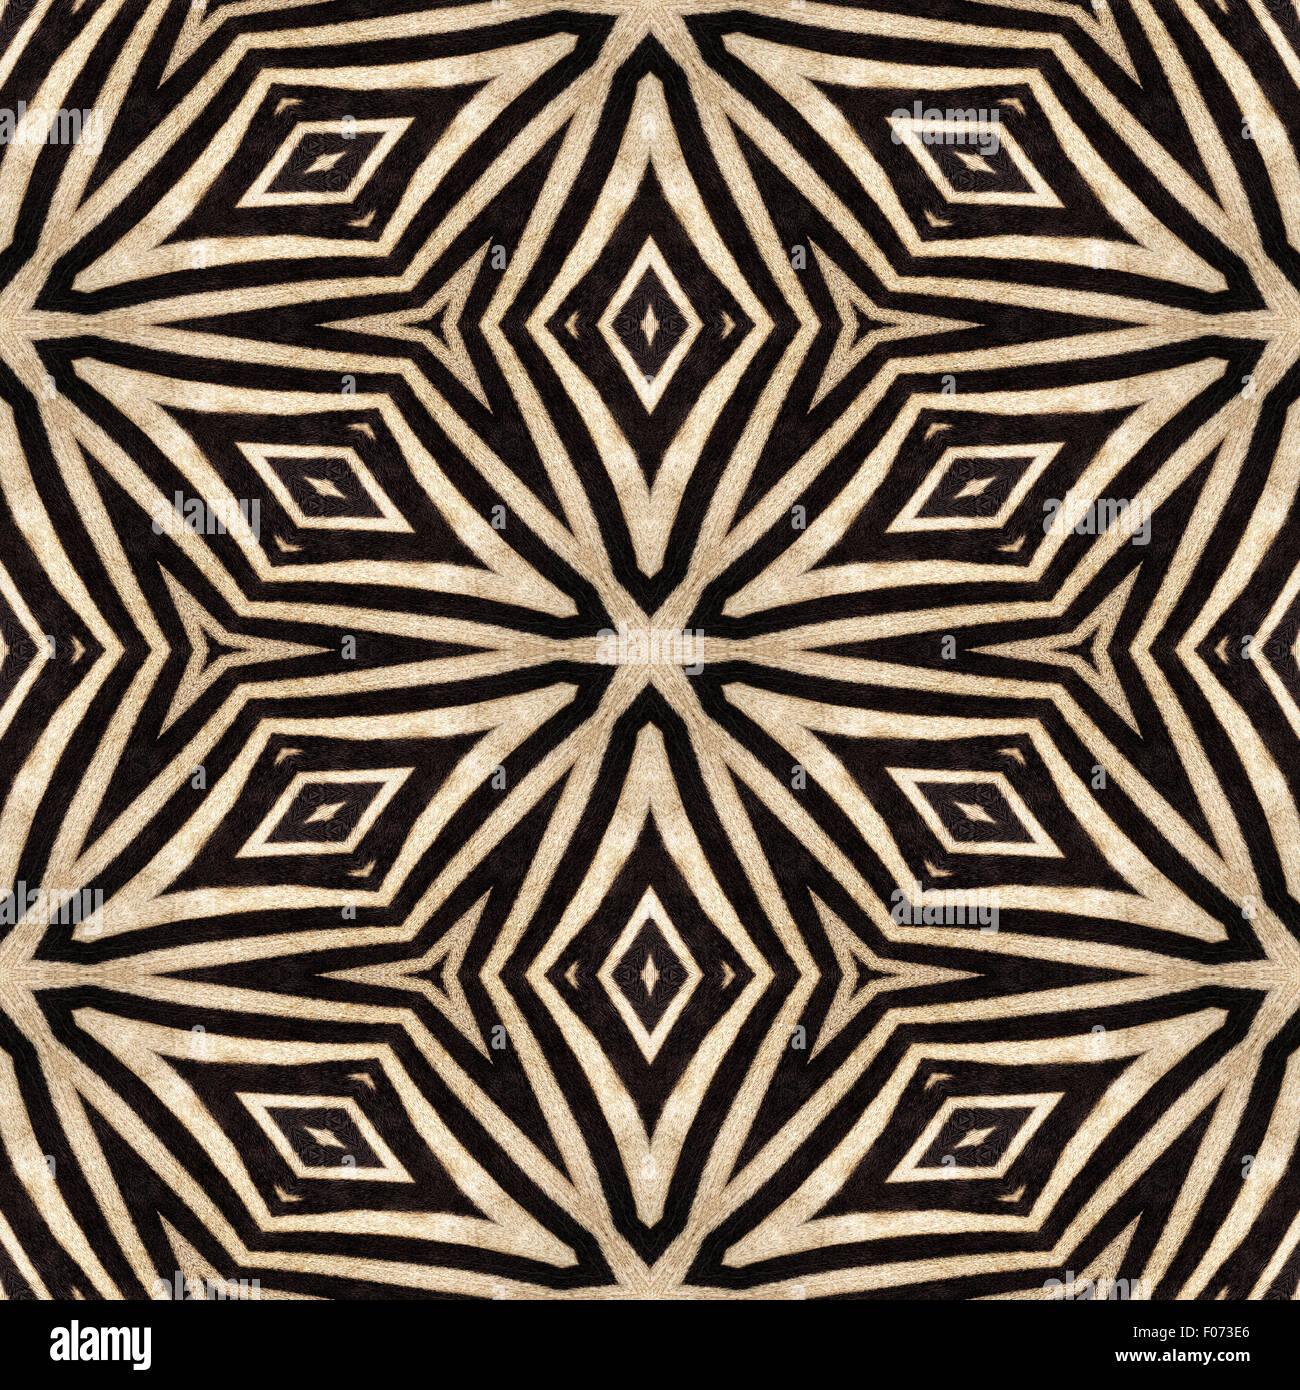 Animal Print Carpet Stock Photos & Animal Print Carpet